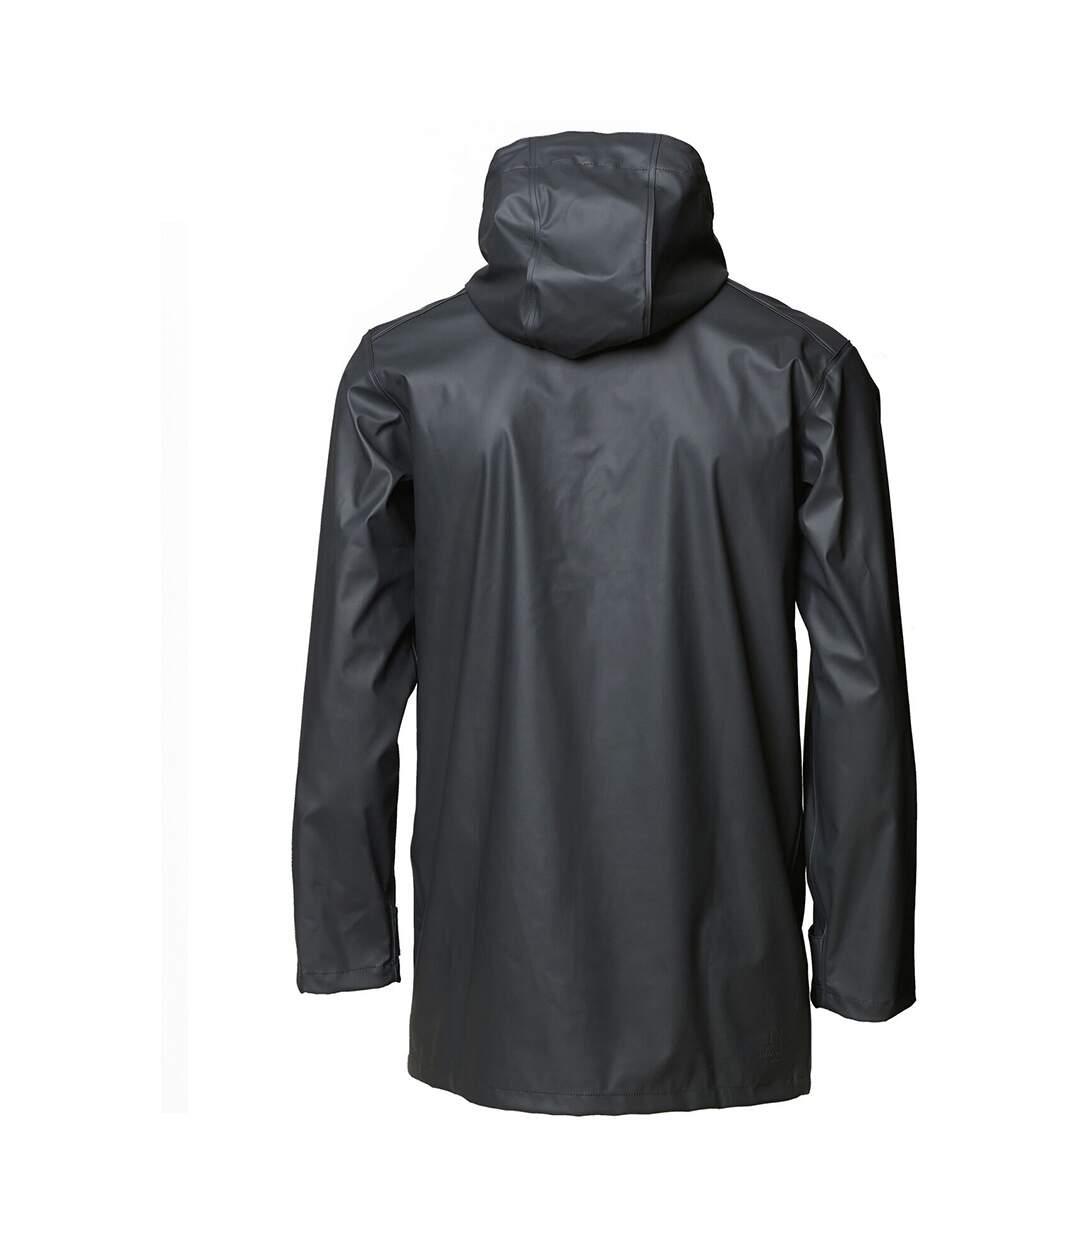 Nimbus Mens Huntington Hooded Waterproof Fashion Raincoat (Charcoal) - UTRW5333